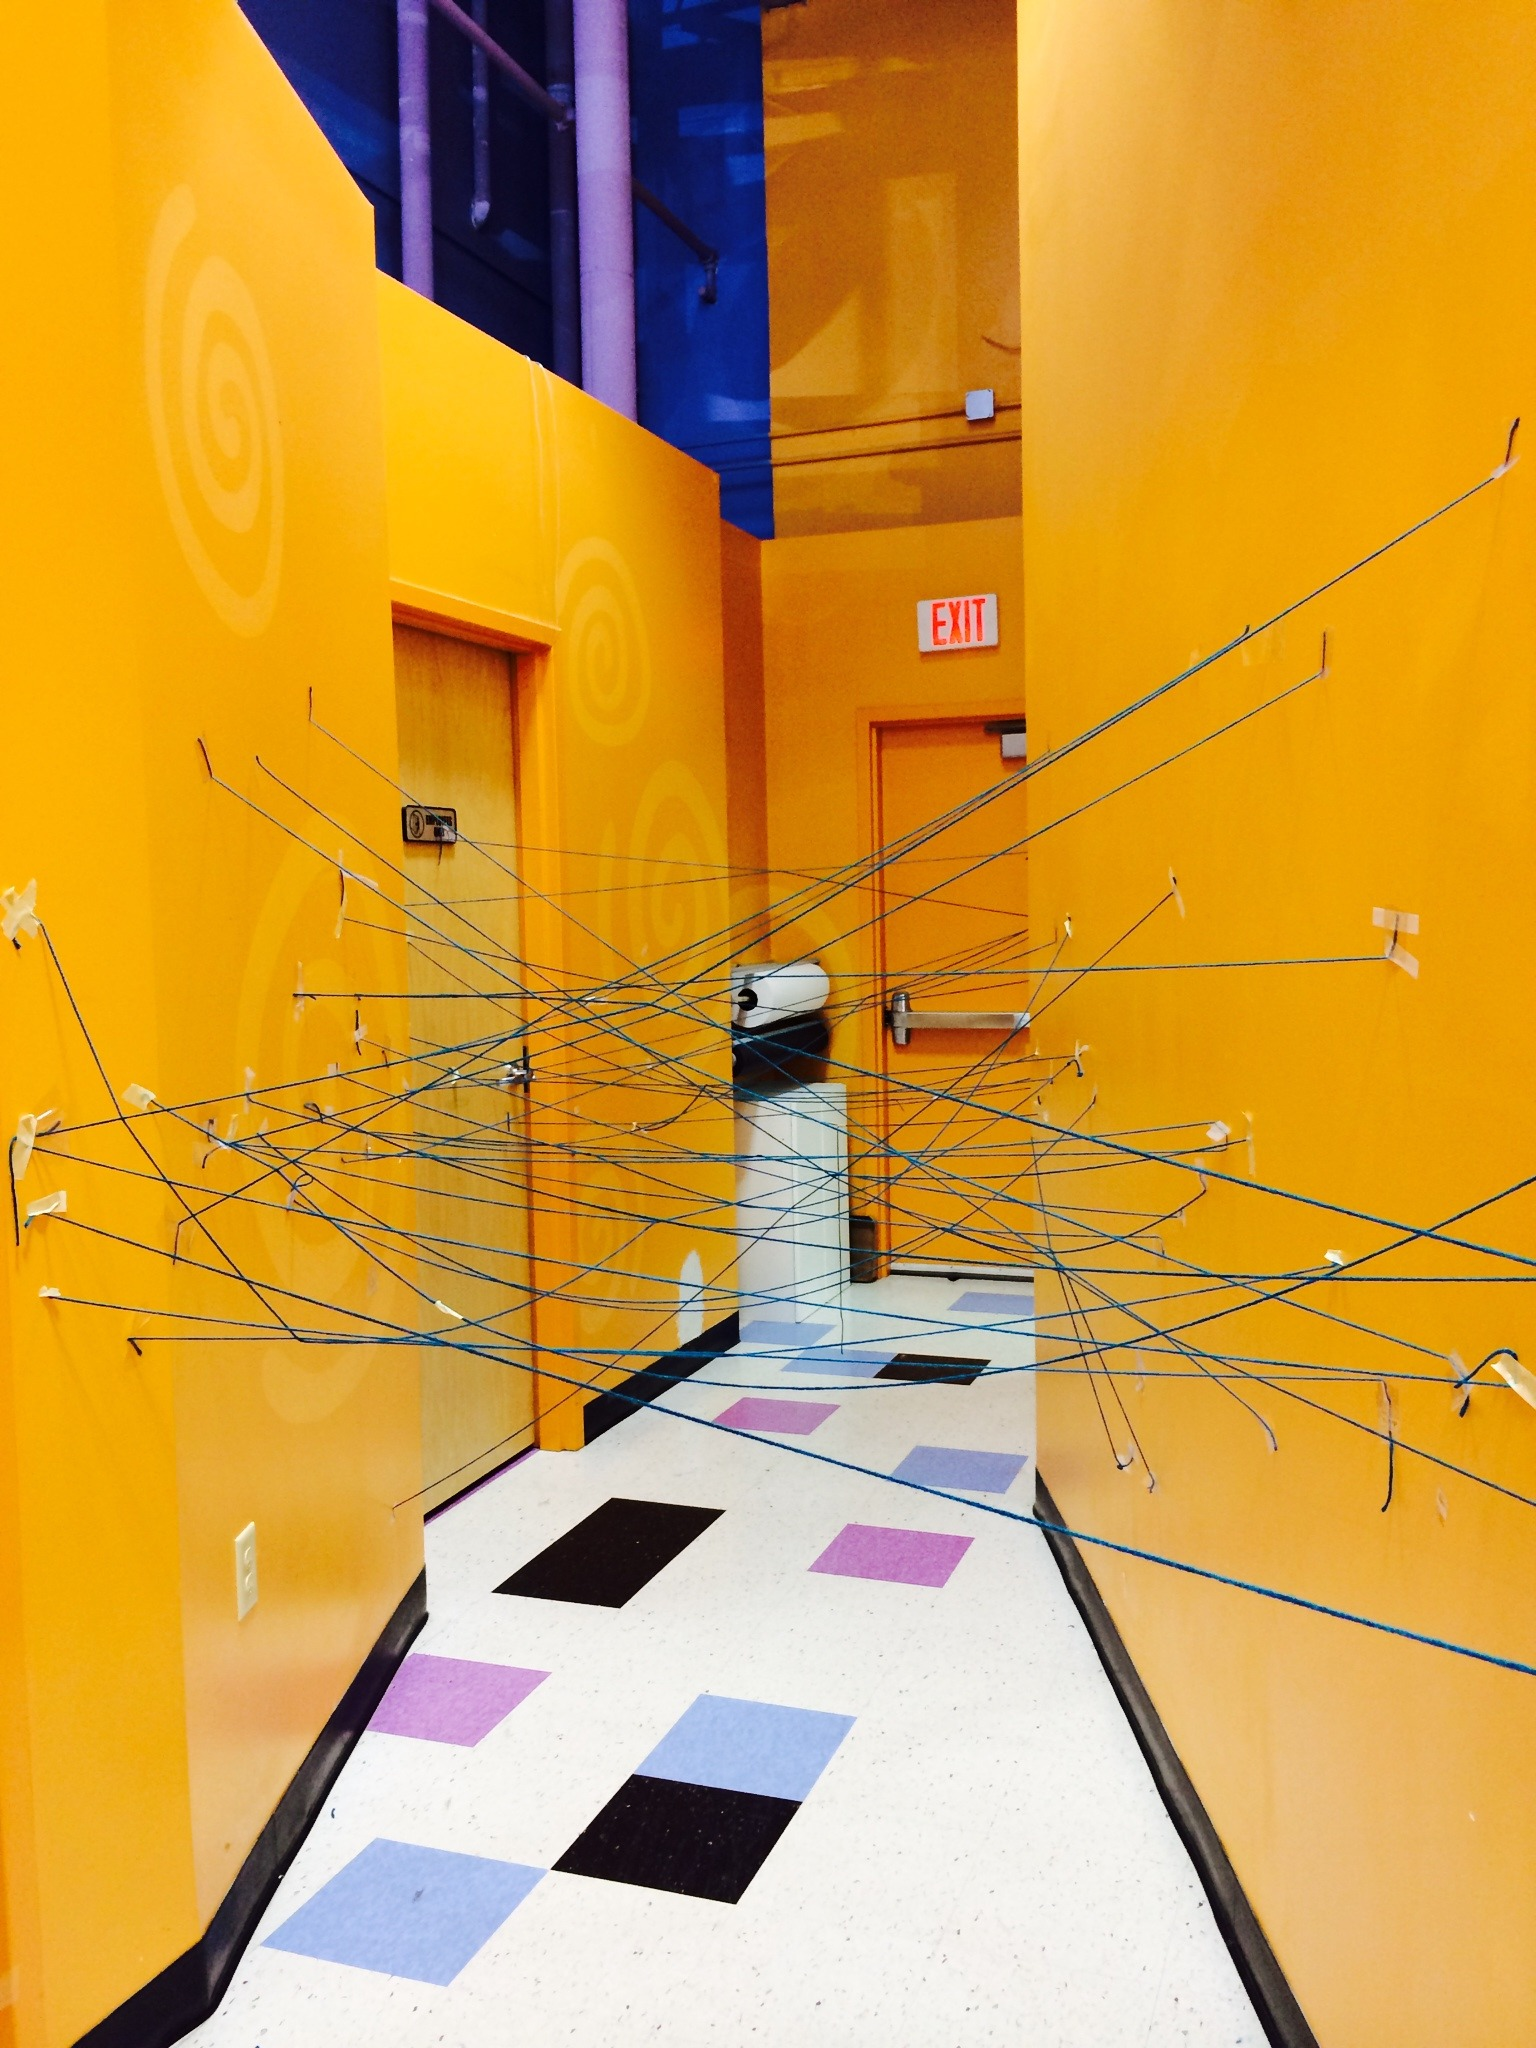 c9f36bd9d1ee3c3c4245_String_installation_at_Messy_Artist.jpeg